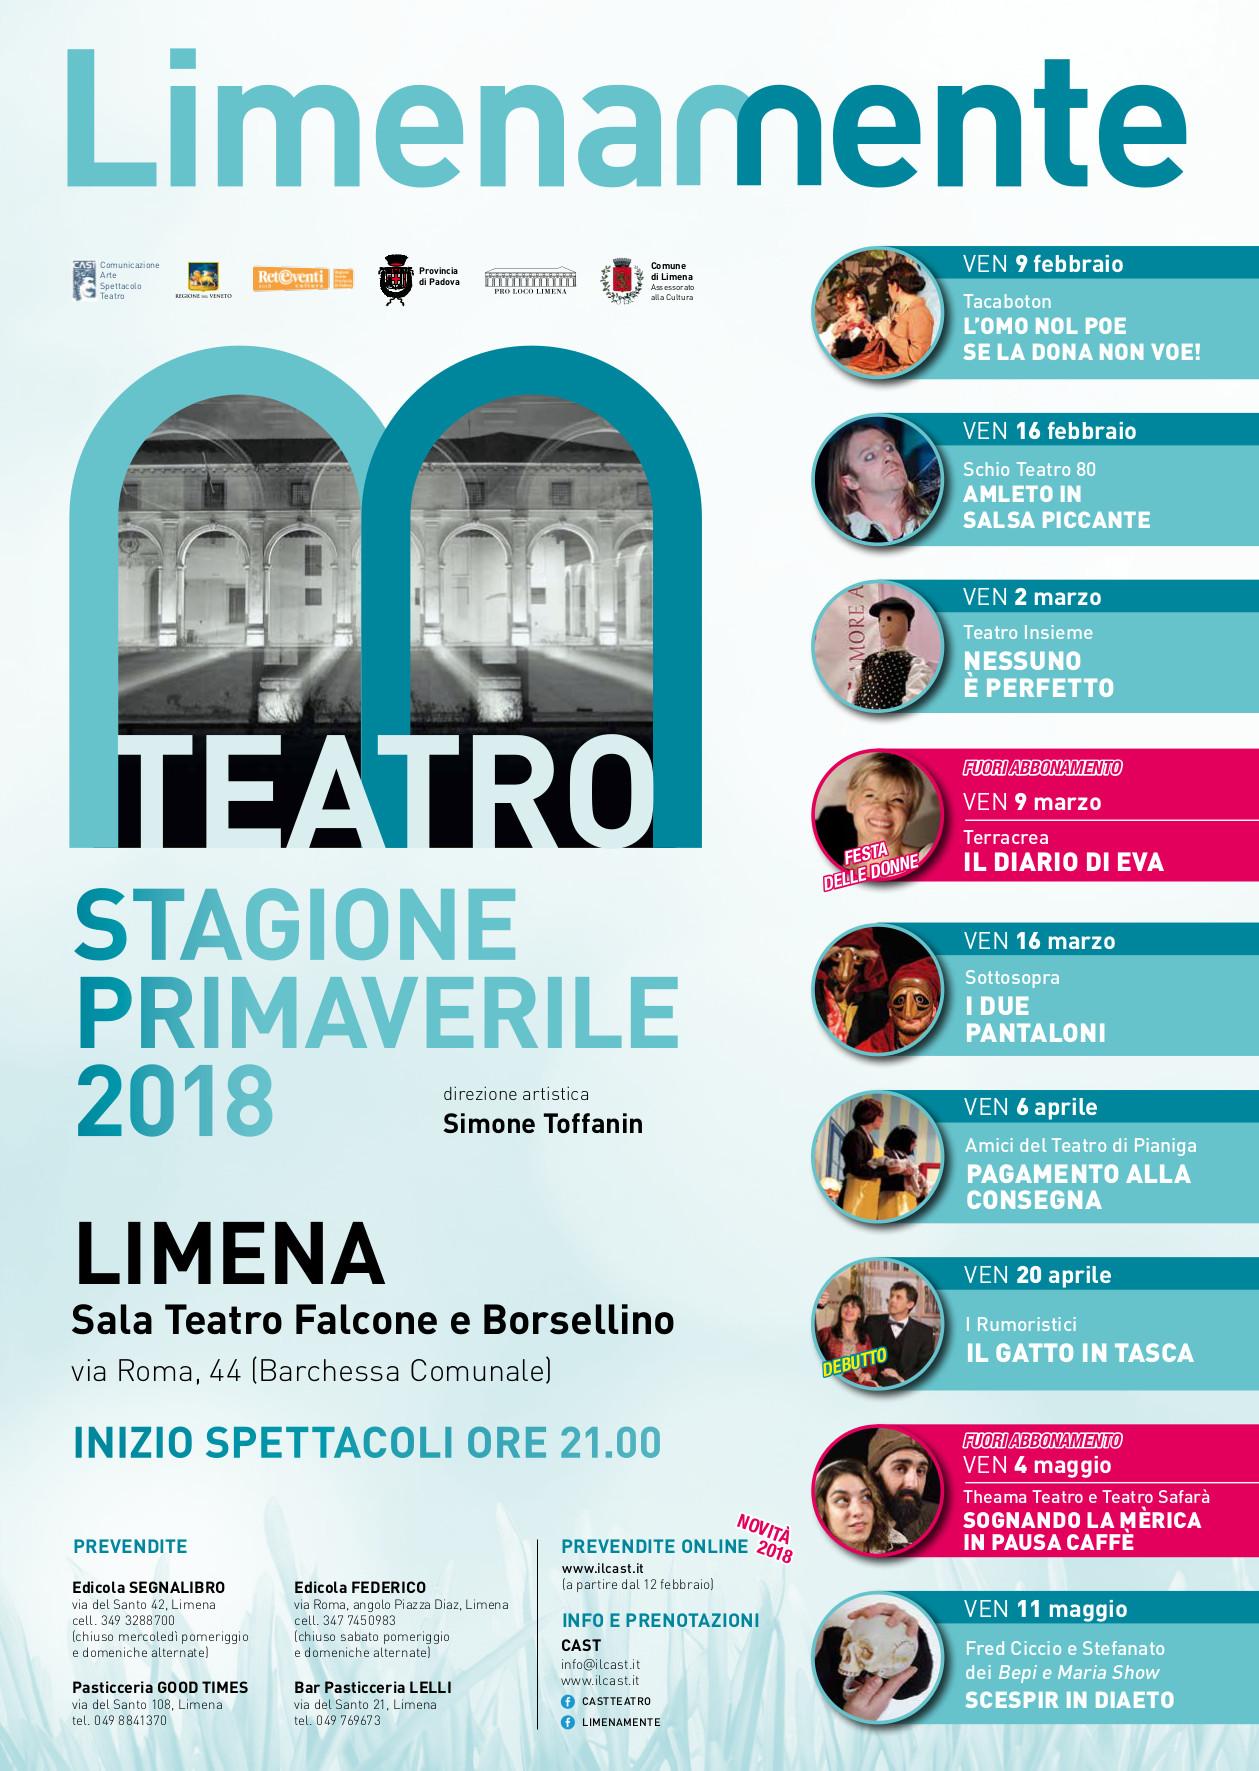 Limenamente Teatro primavera 2018